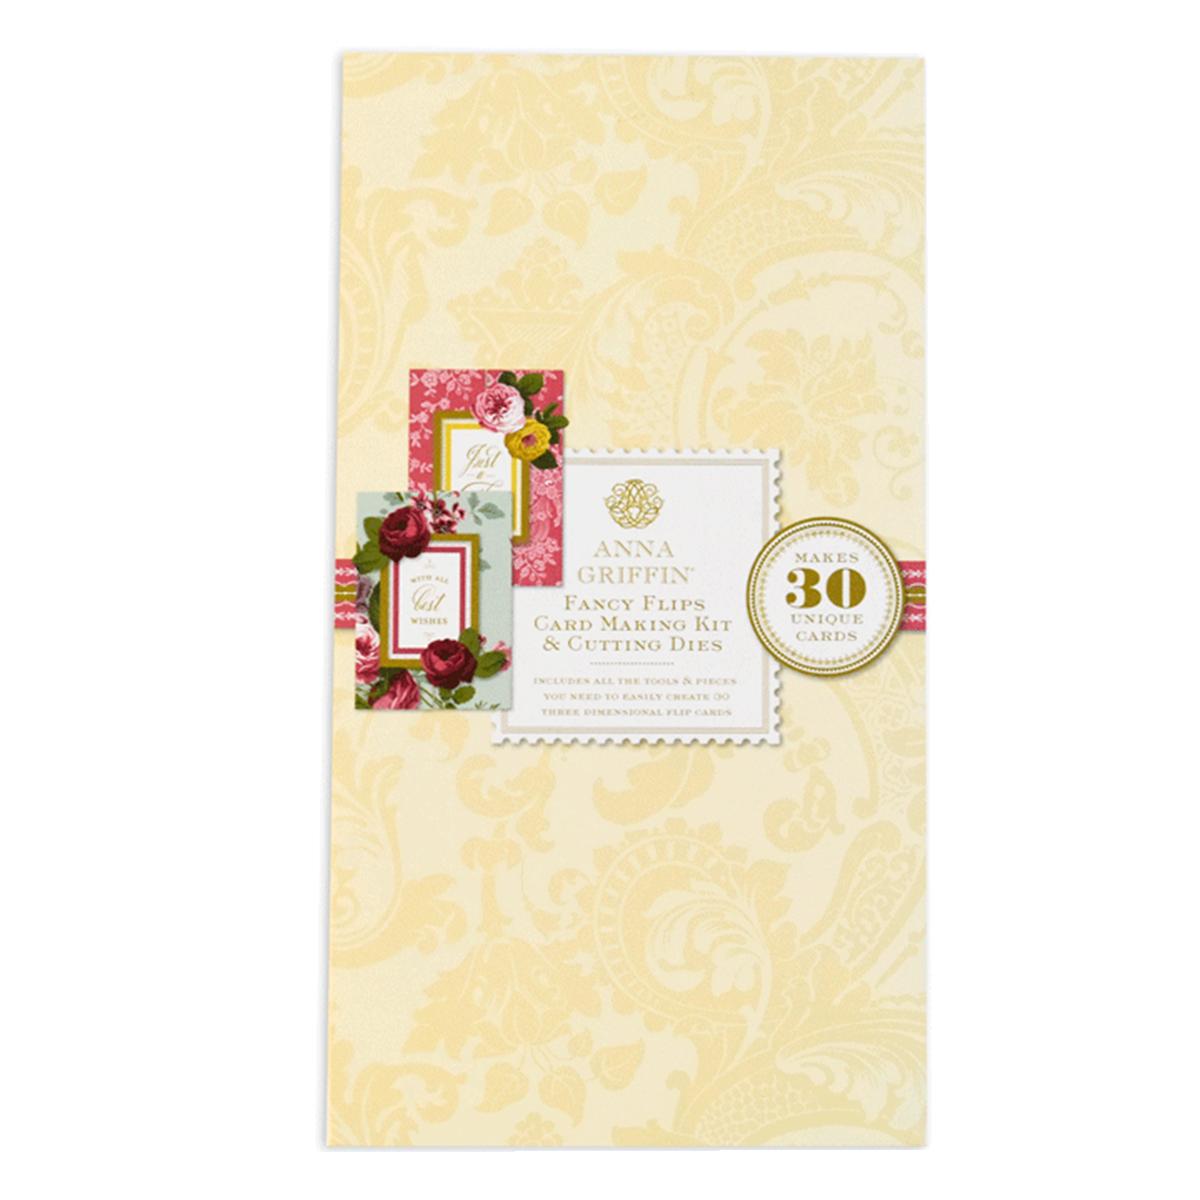 Fancy Flip Card Kit With Dies